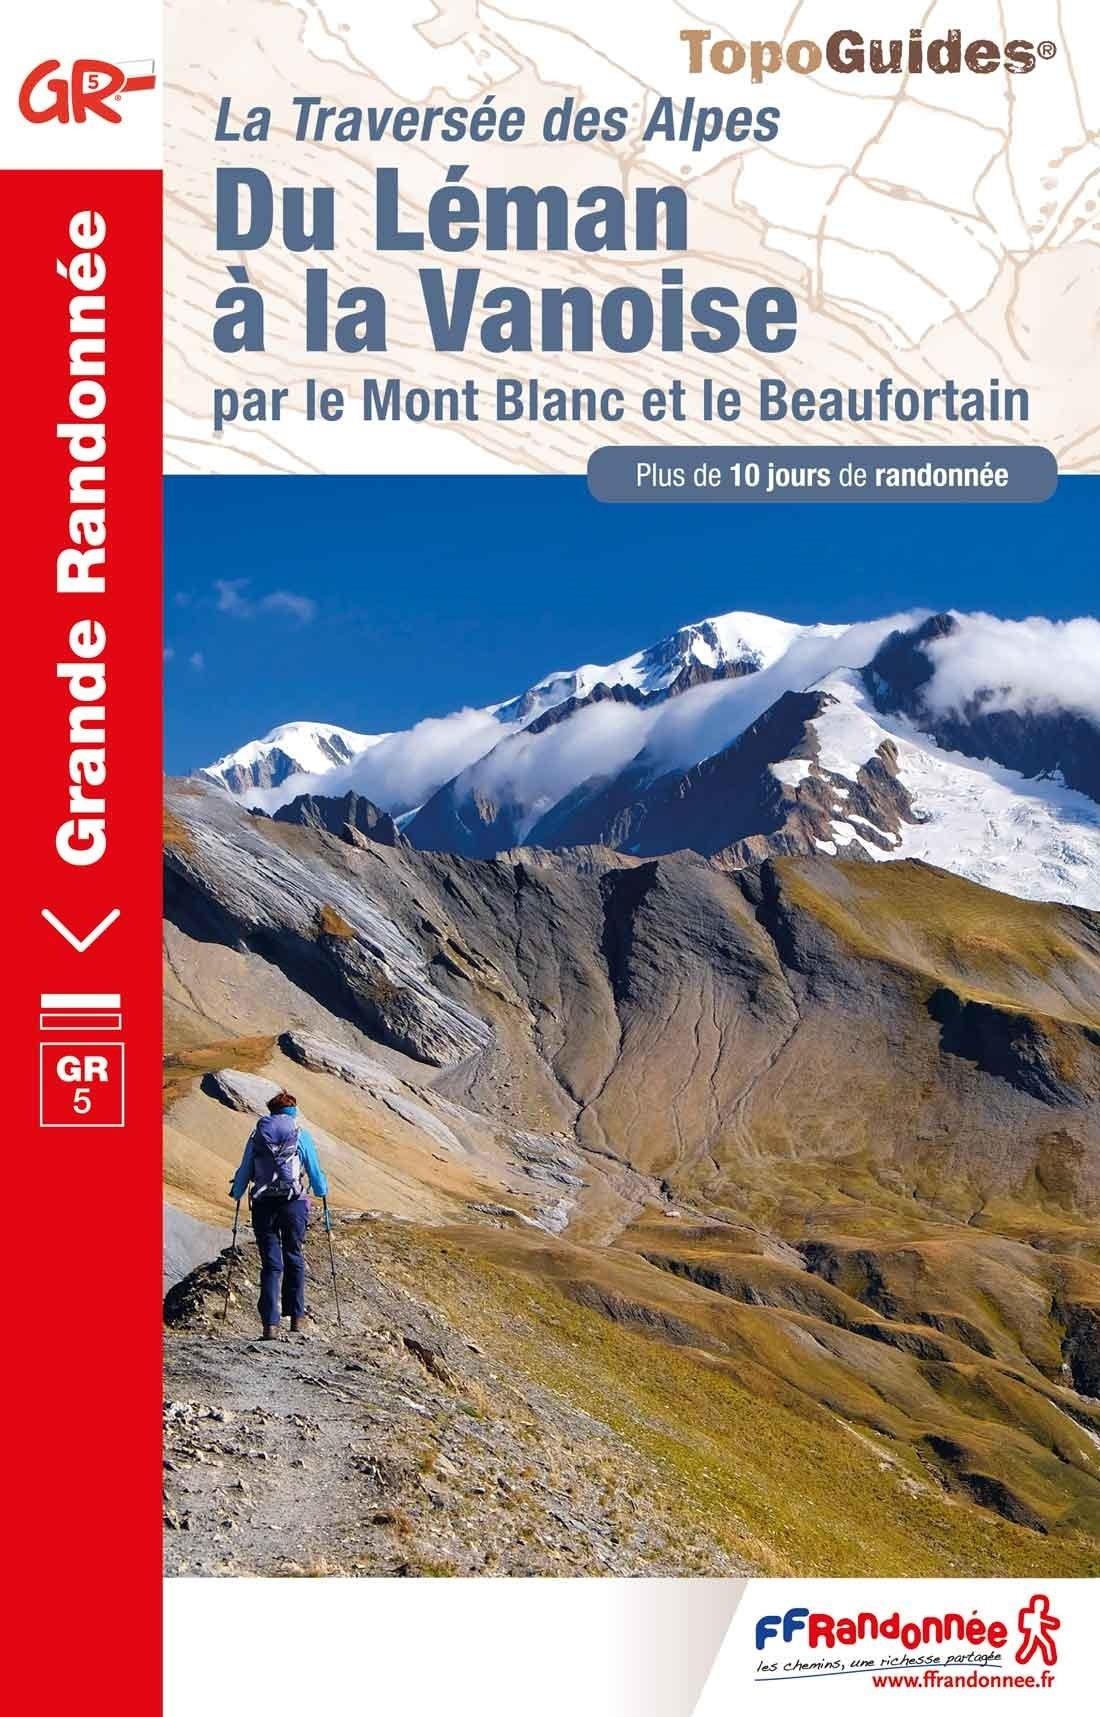 GR-5 | TG-504  Du Léman à la Vanoise | wandelgids GR5 9782751403088  FFRP Topoguides  Meerdaagse wandelroutes, Wandelgidsen Franse Alpen: noord